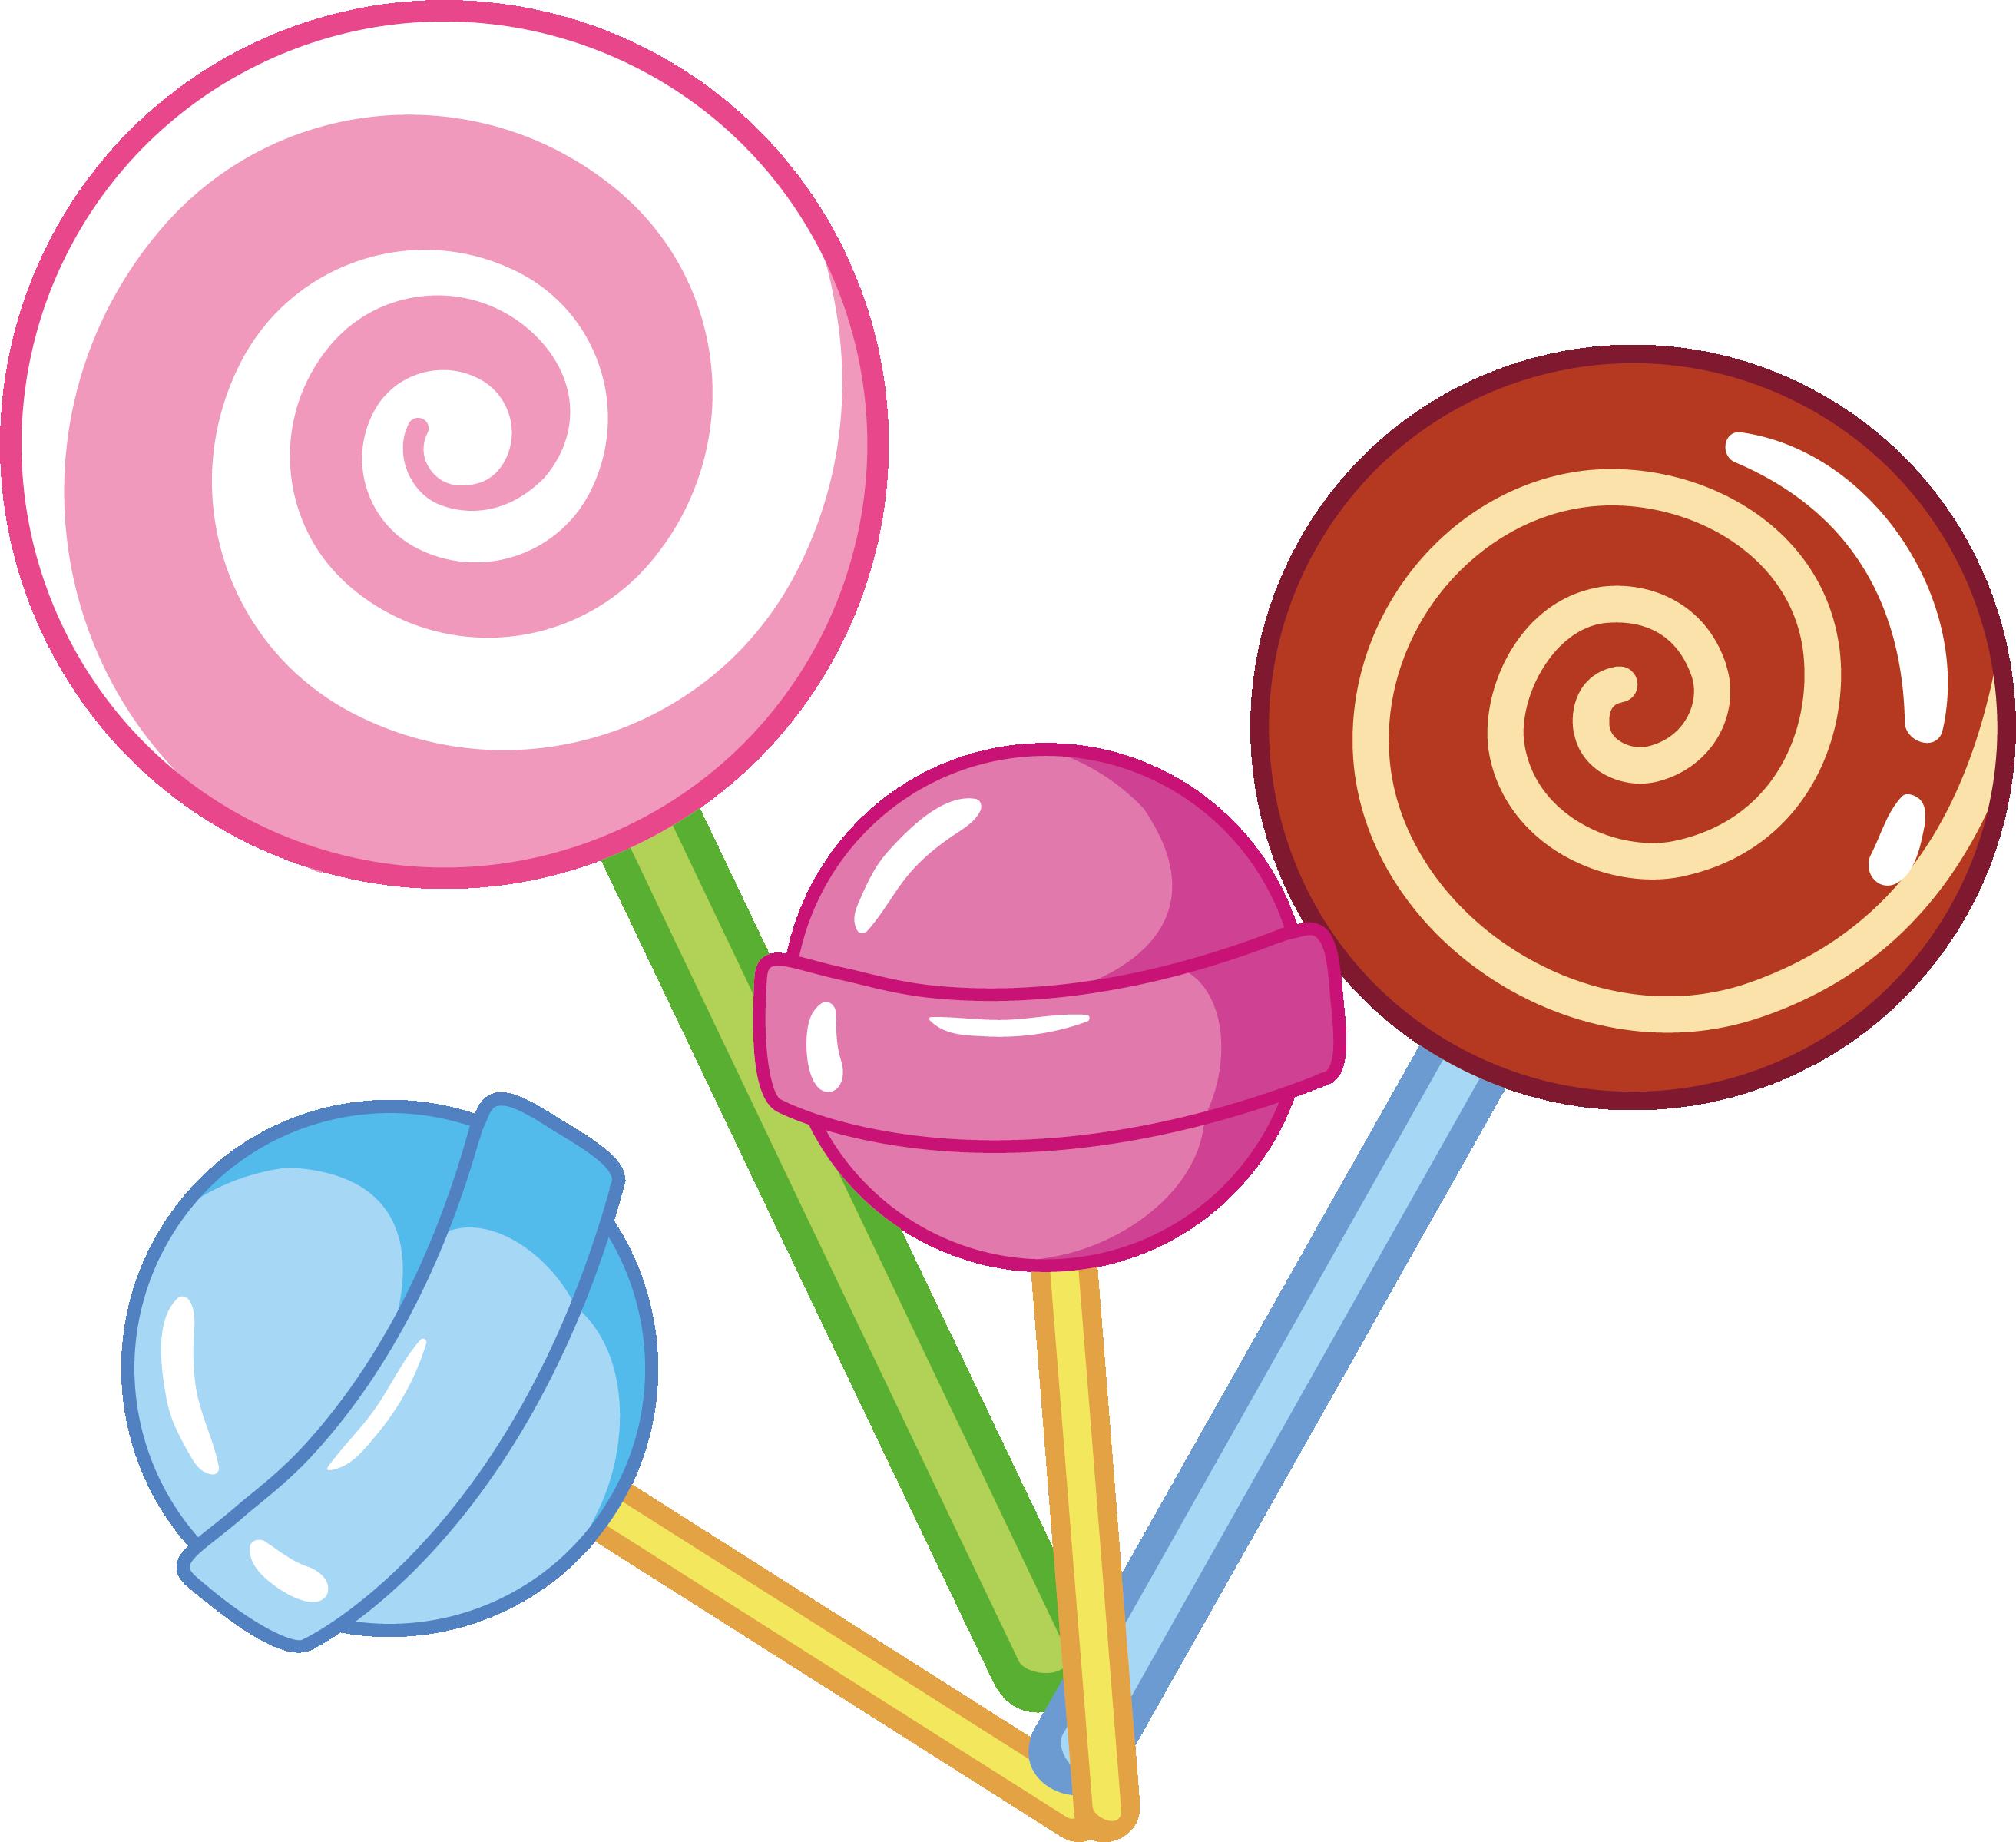 2625x2398 Lollipop Euclidean Vector Candy